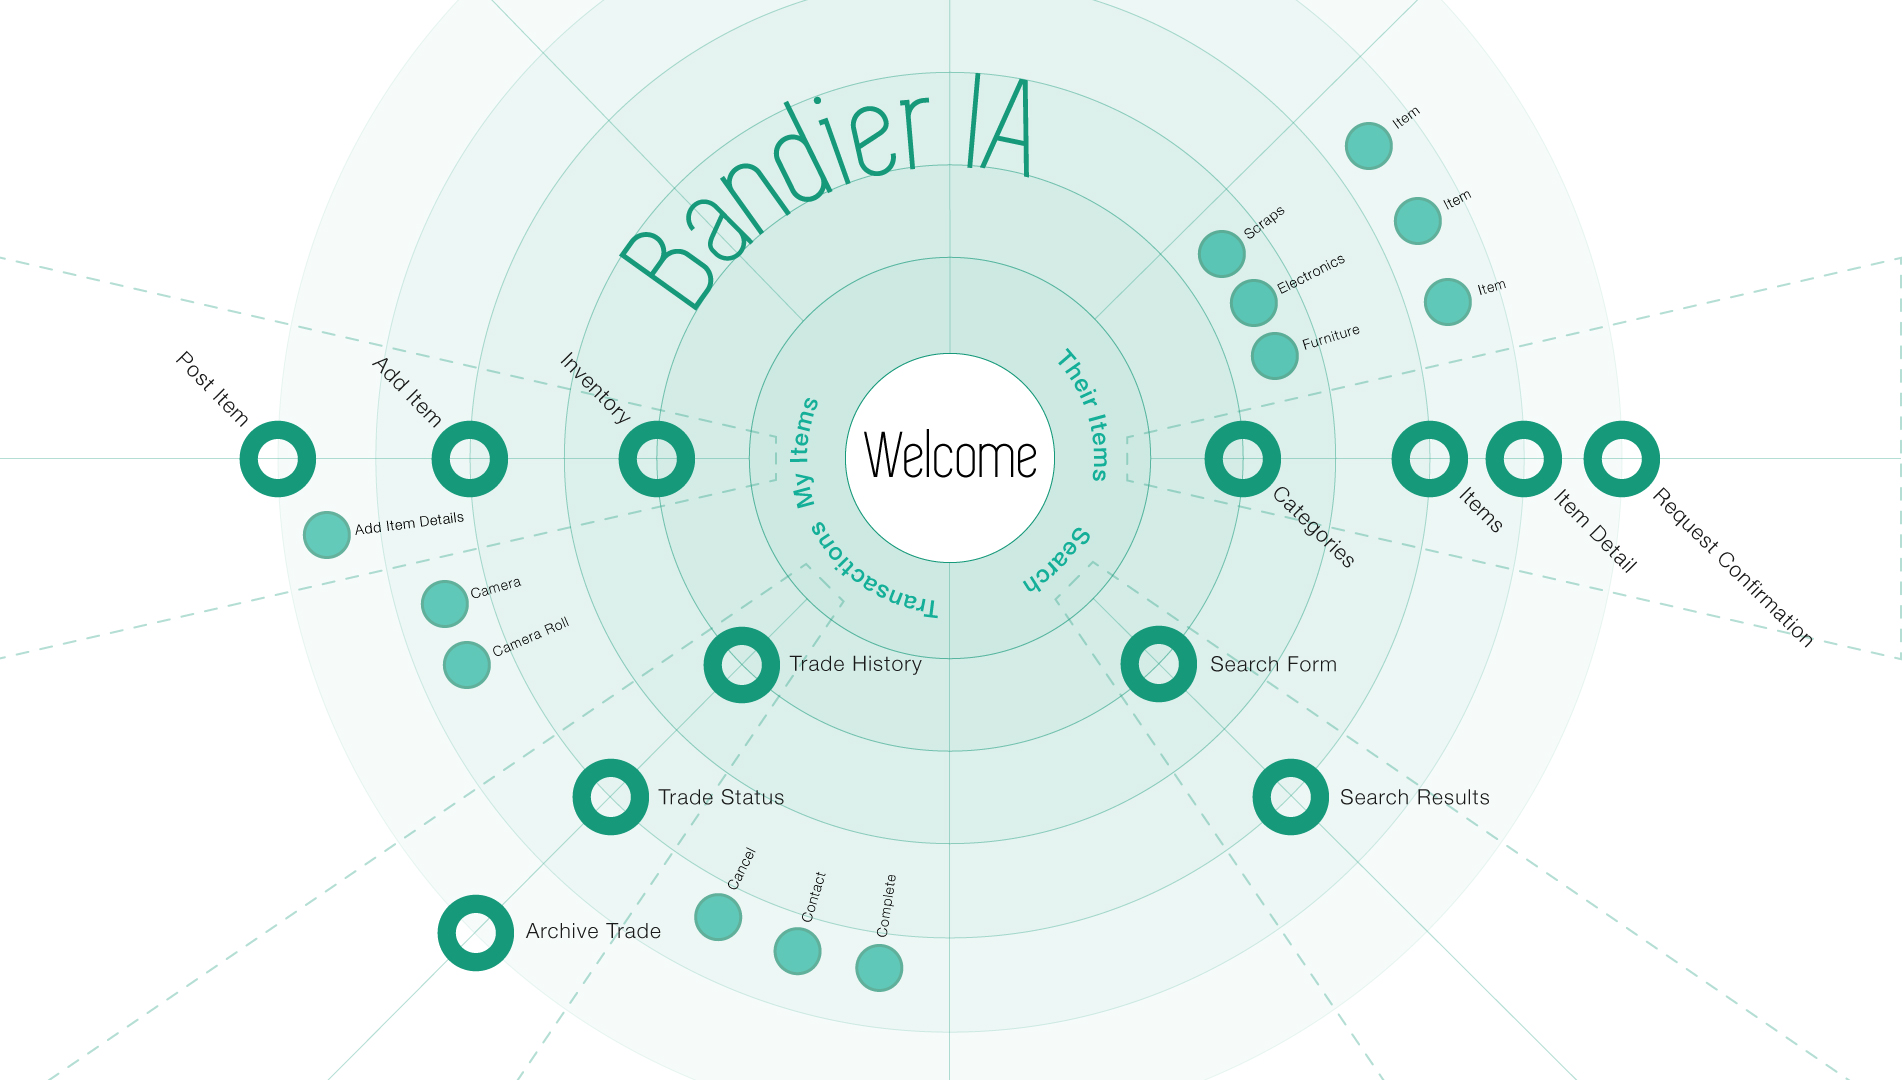 bandier_IA_diagram.jpg